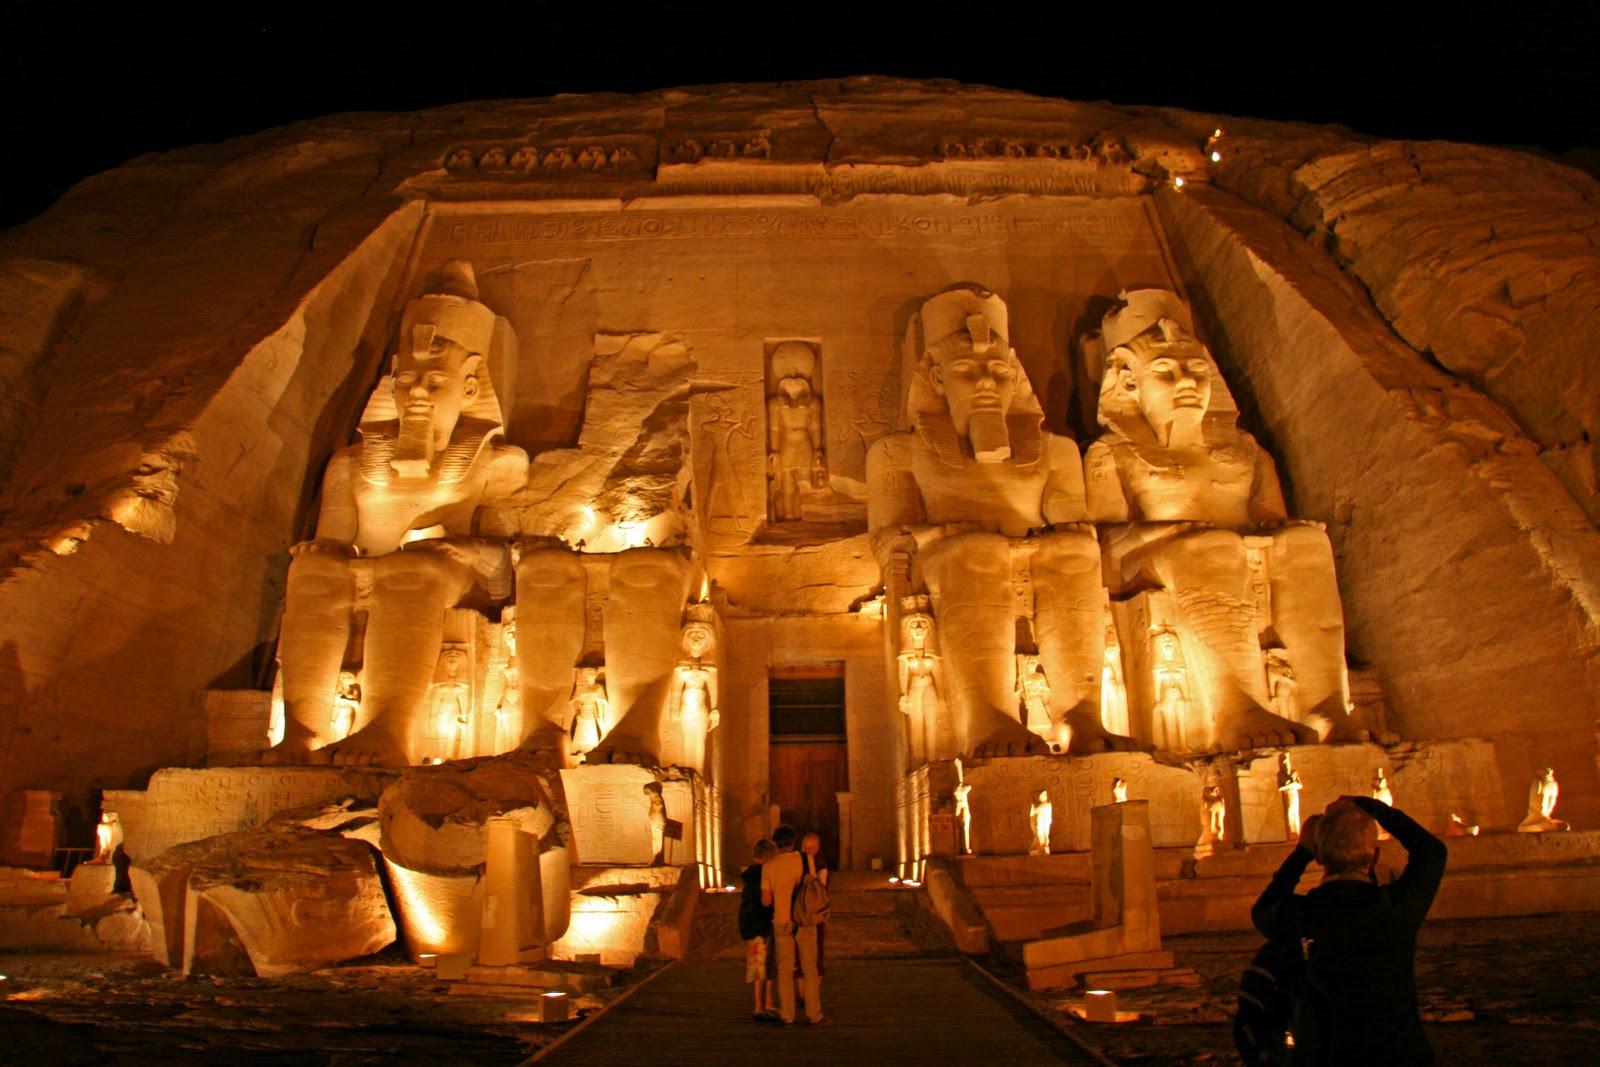 http://2.bp.blogspot.com/-Edvtw5i1N2Q/TsUK-ntIQYI/AAAAAAAAFFo/Oq-mbvq7hRY/s1600/egypt-pyramids+wallpaper.jpg